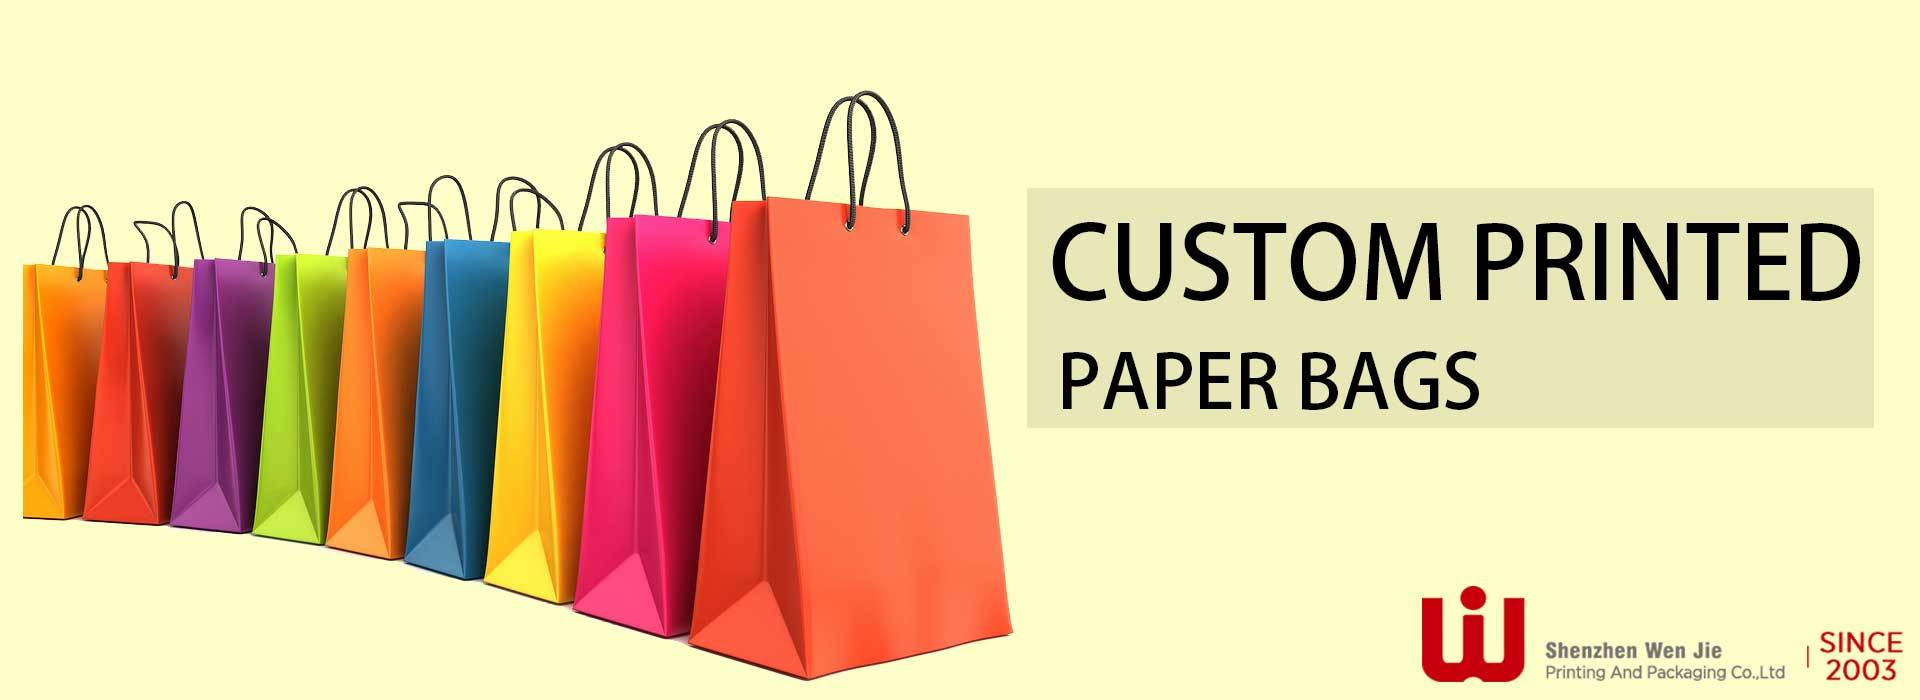 paper bag supplier, paper bags wholesale, paper bag manufacturer